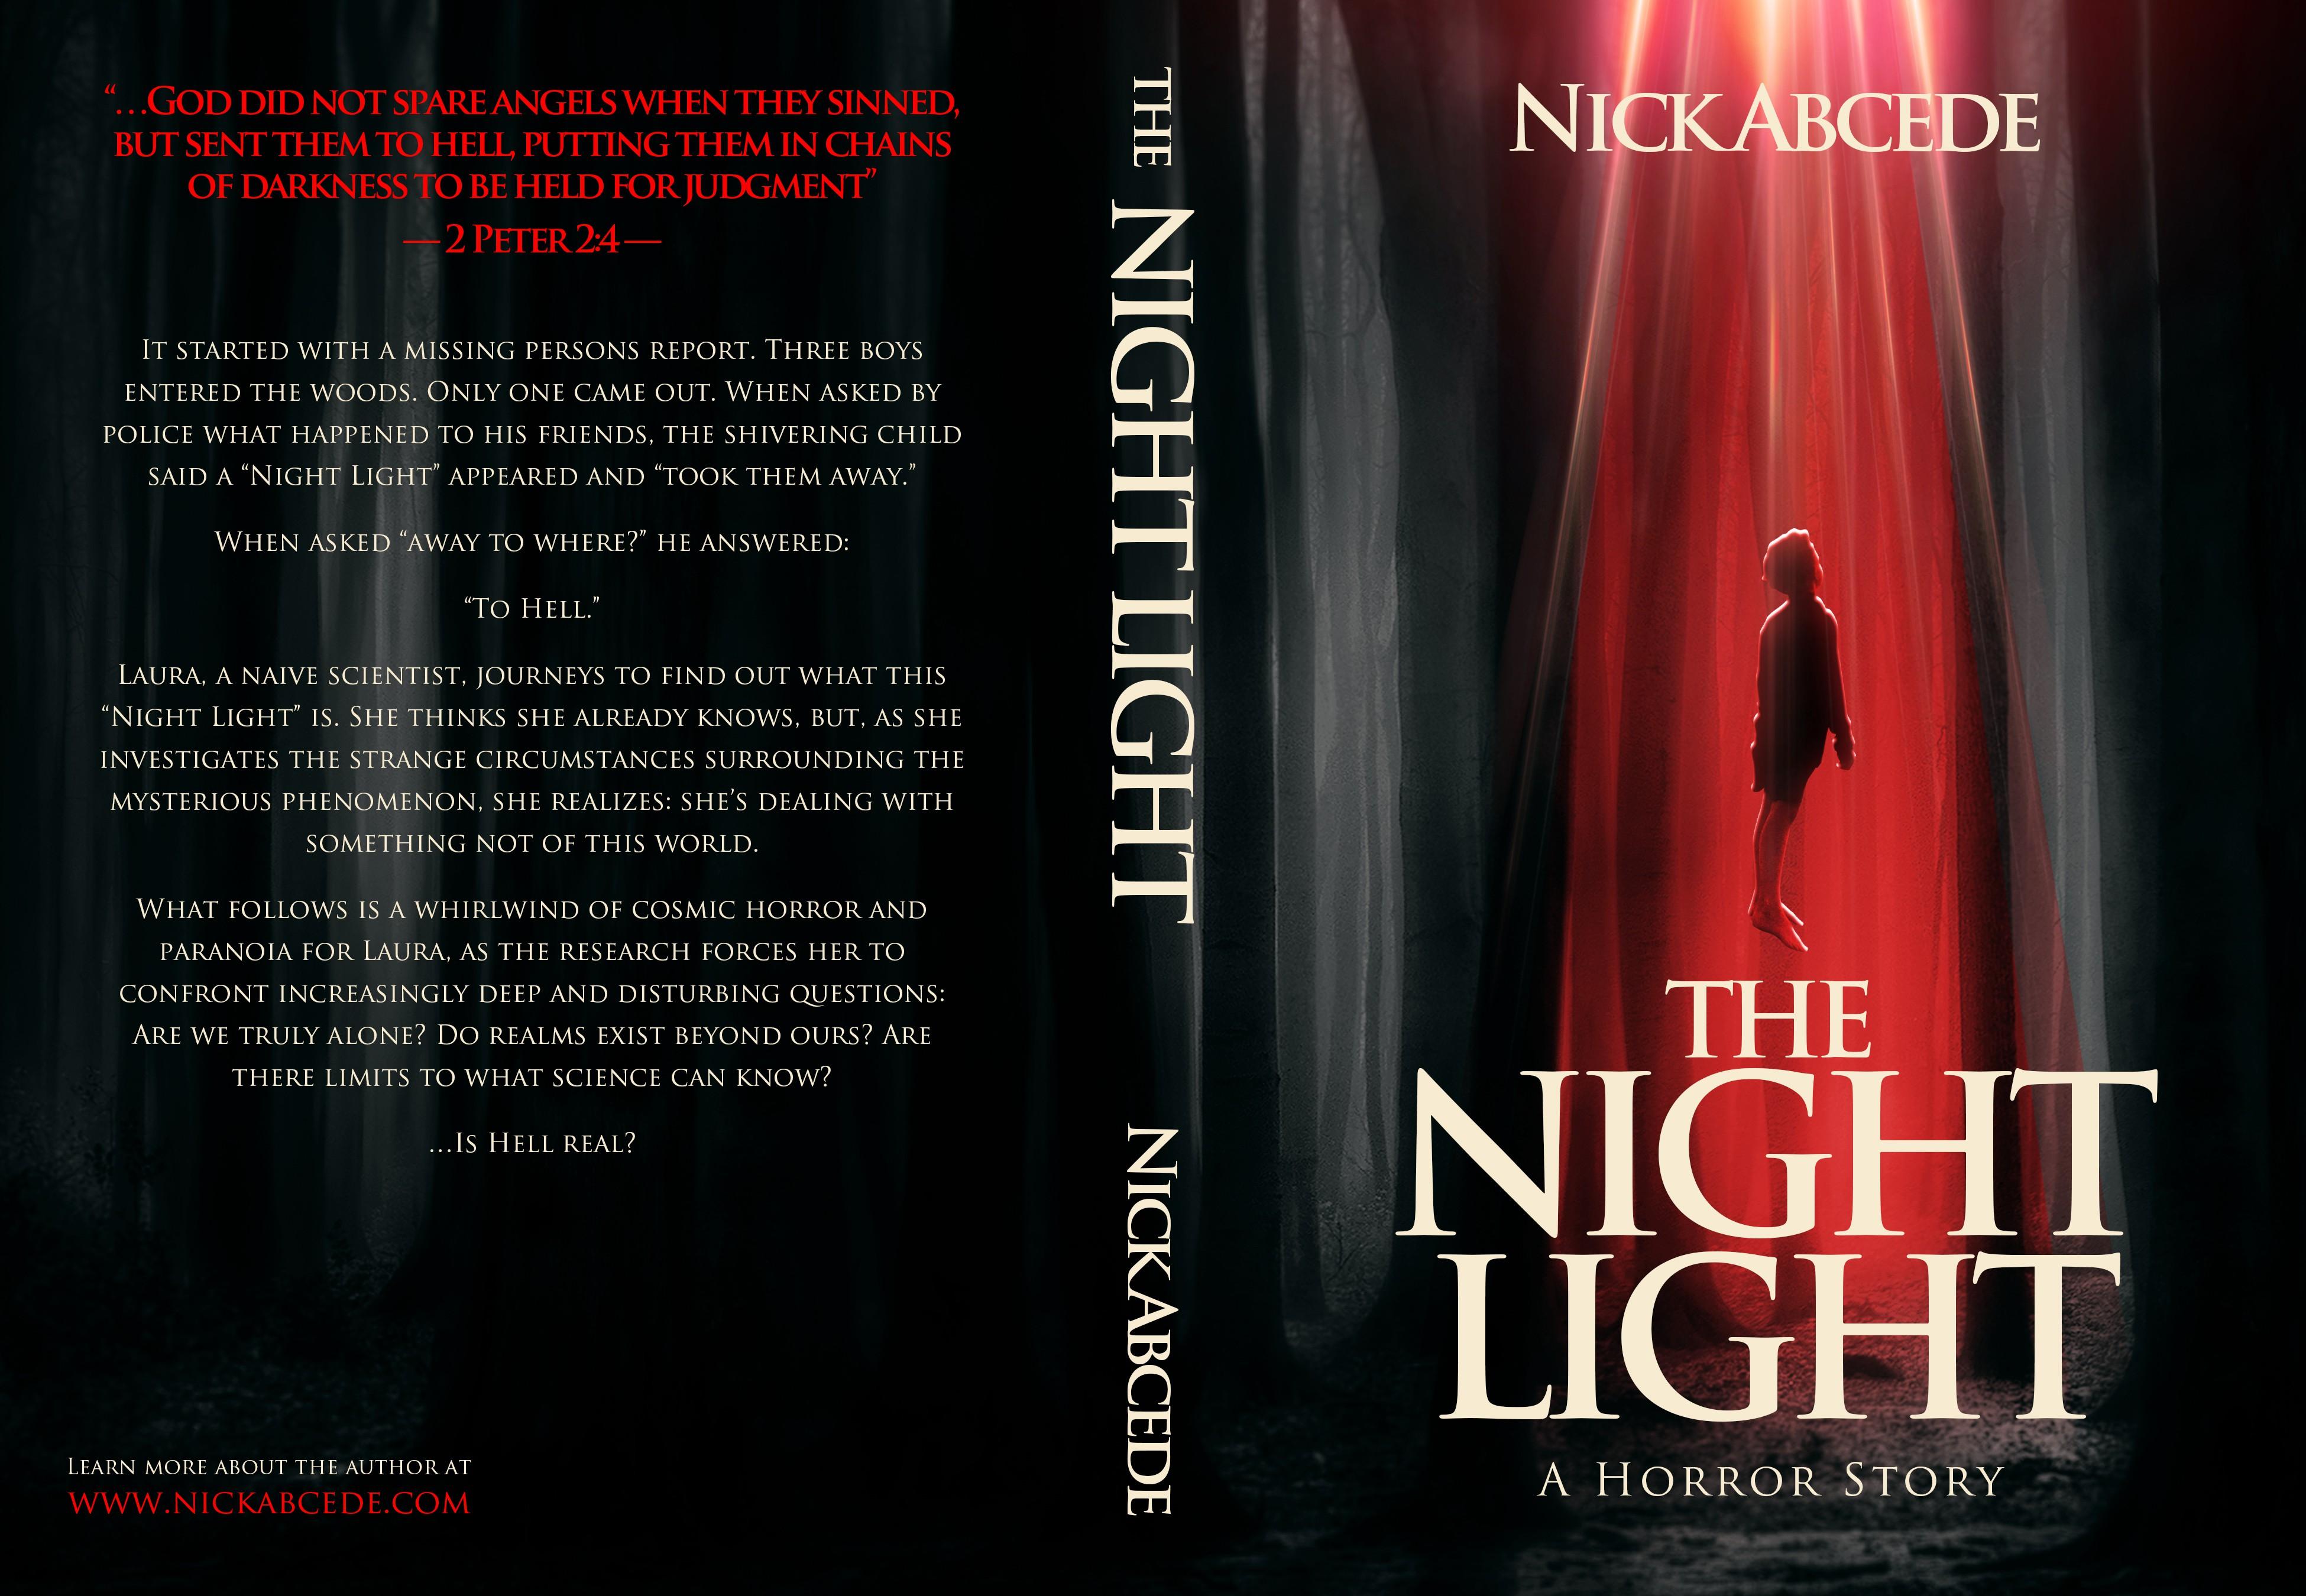 Creepy book cover for a sci-fi alien horror